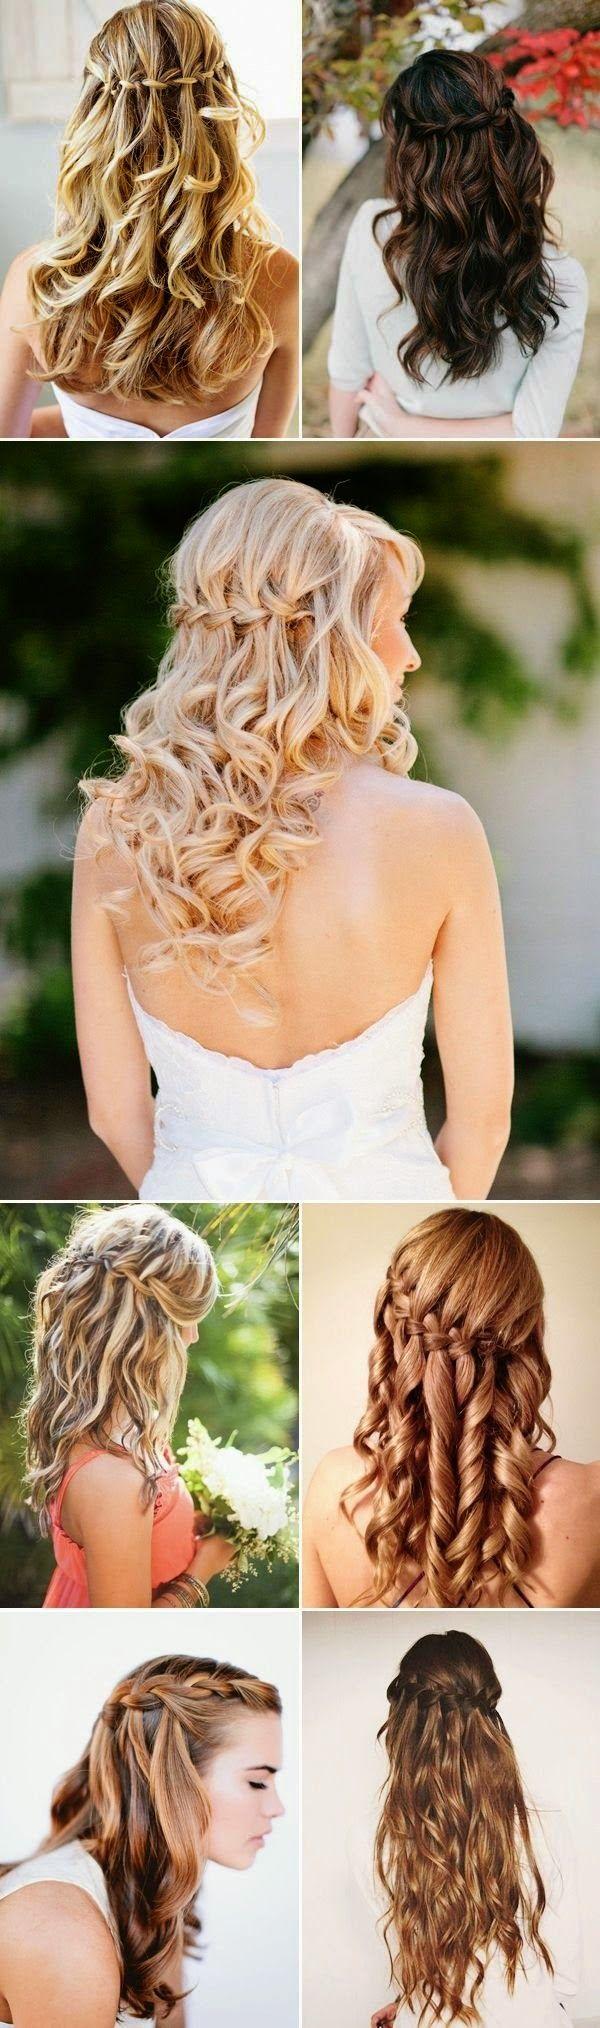 Amazing hairstyle u haircuts for bridal wedding pinterest